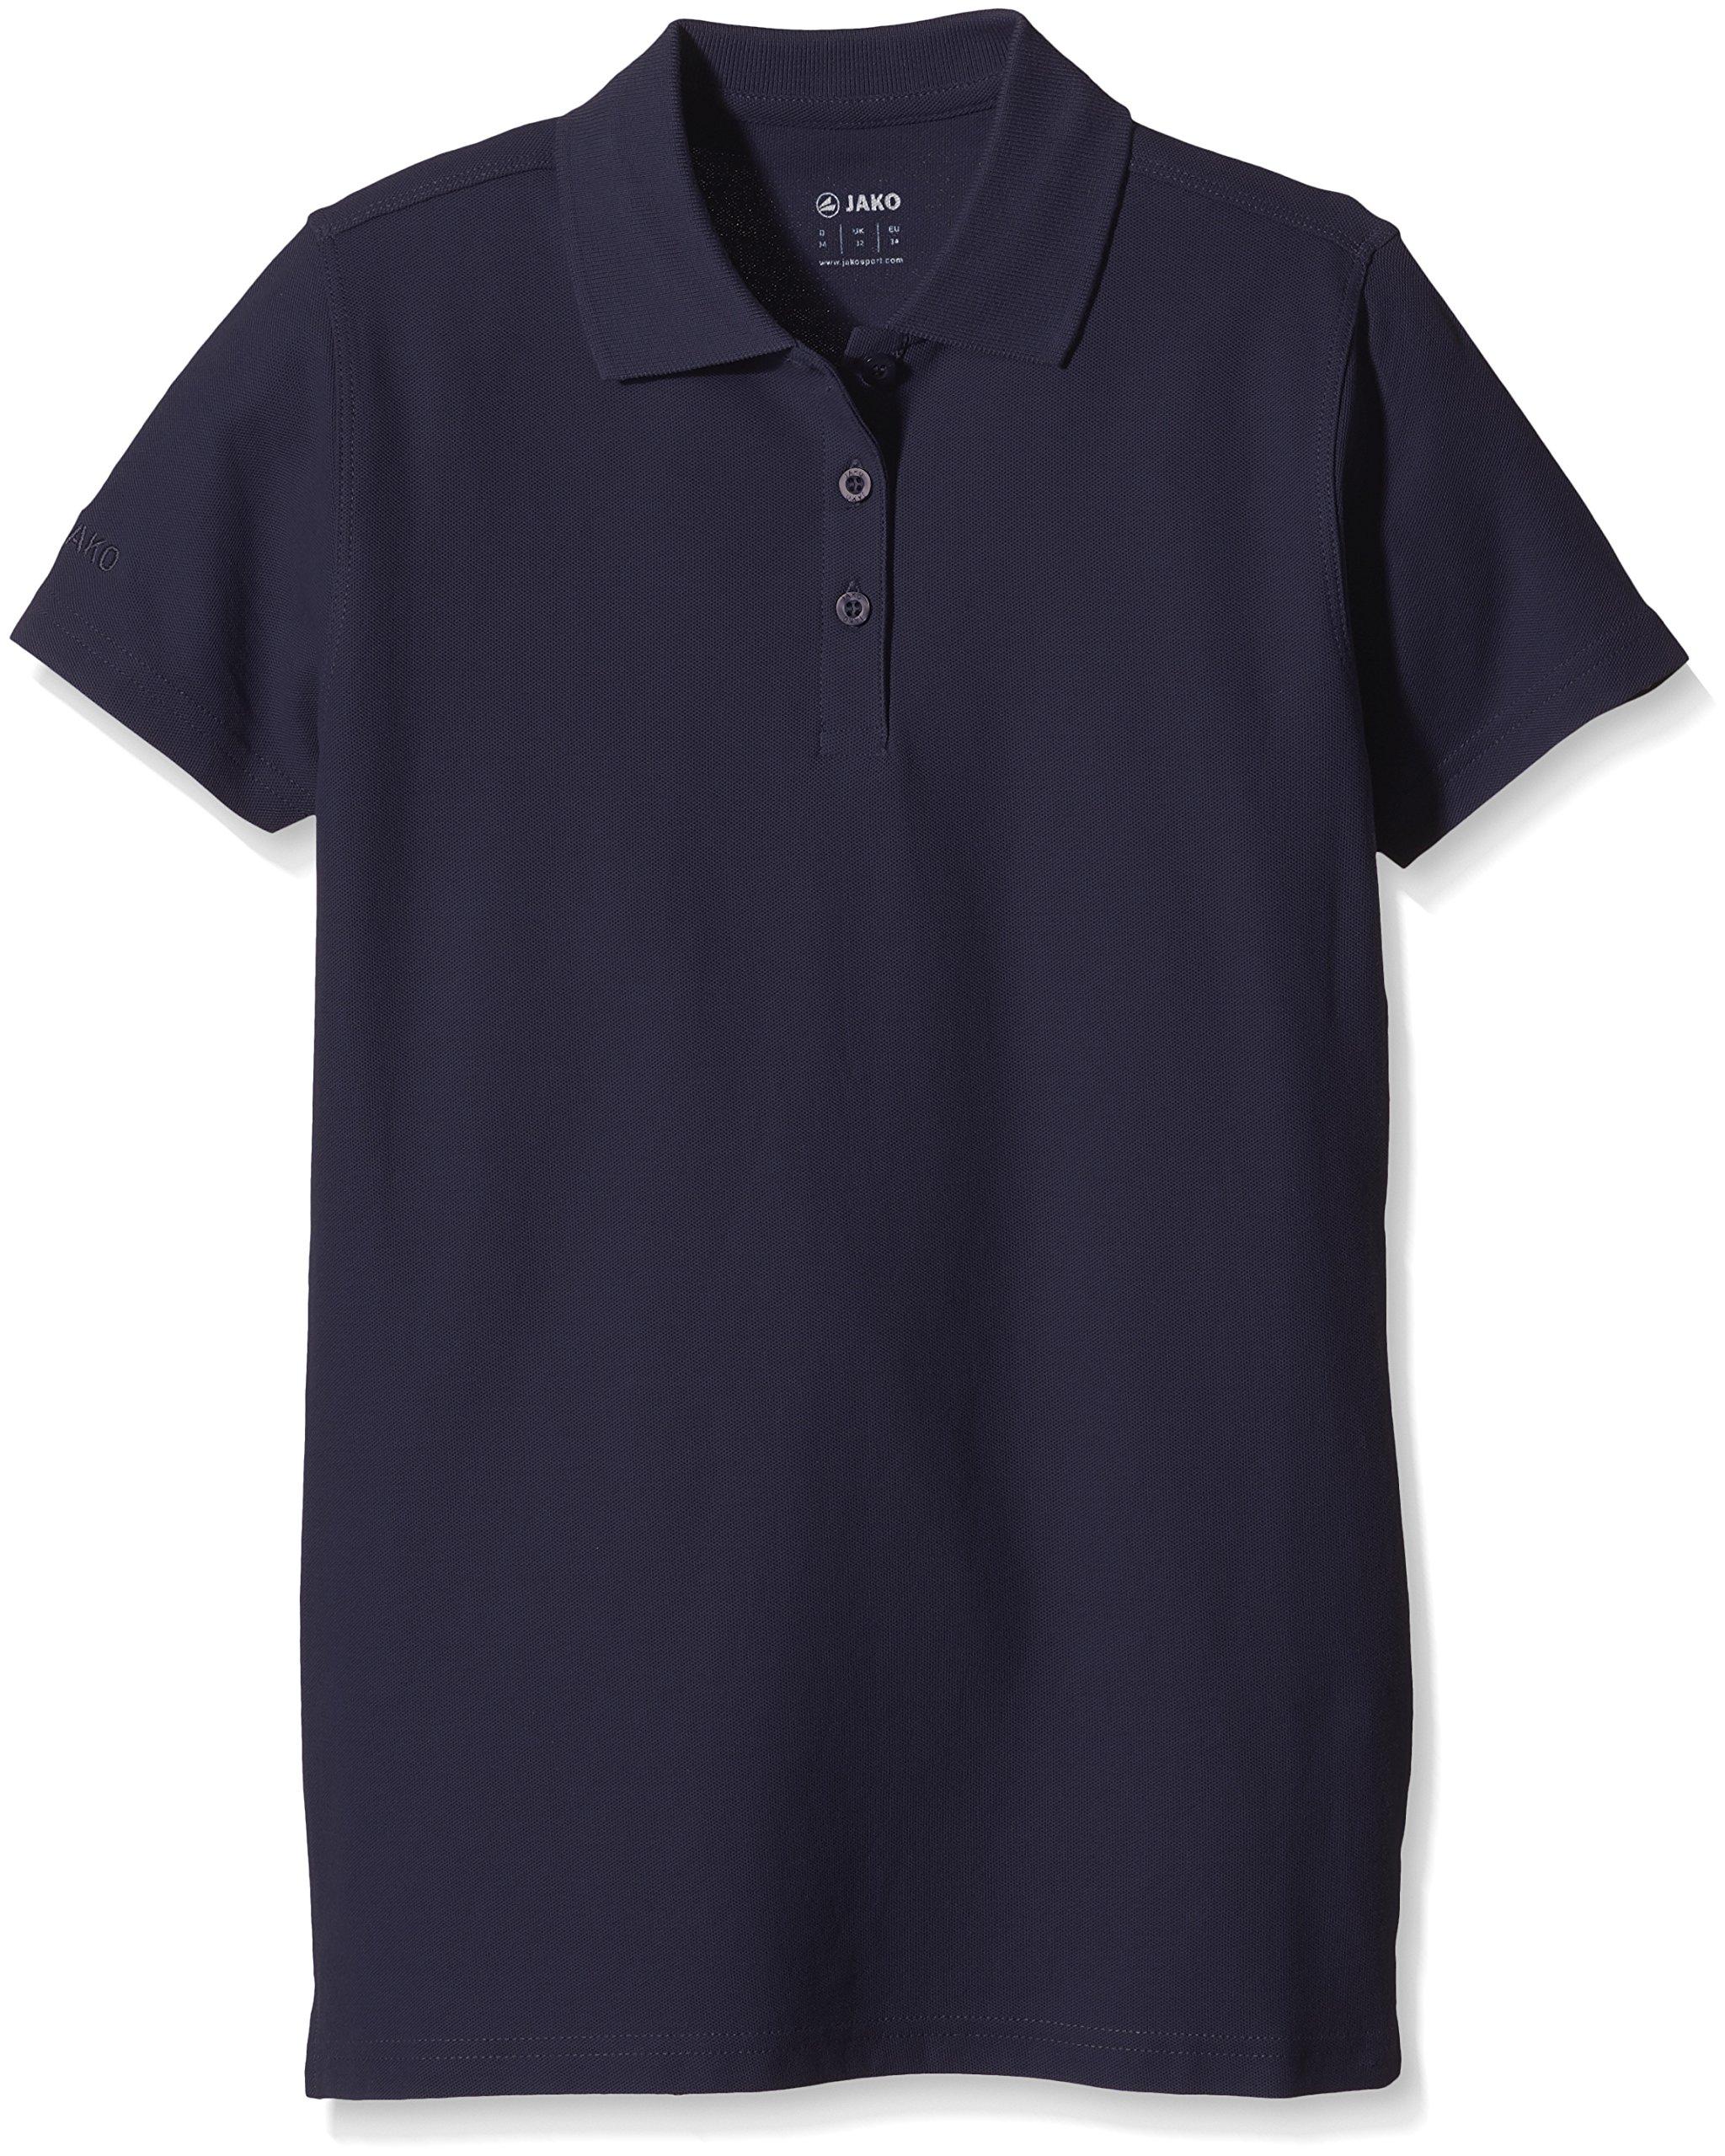 7a12090c3e9a Jako Polo Team Unisex T-shirt   Amazon